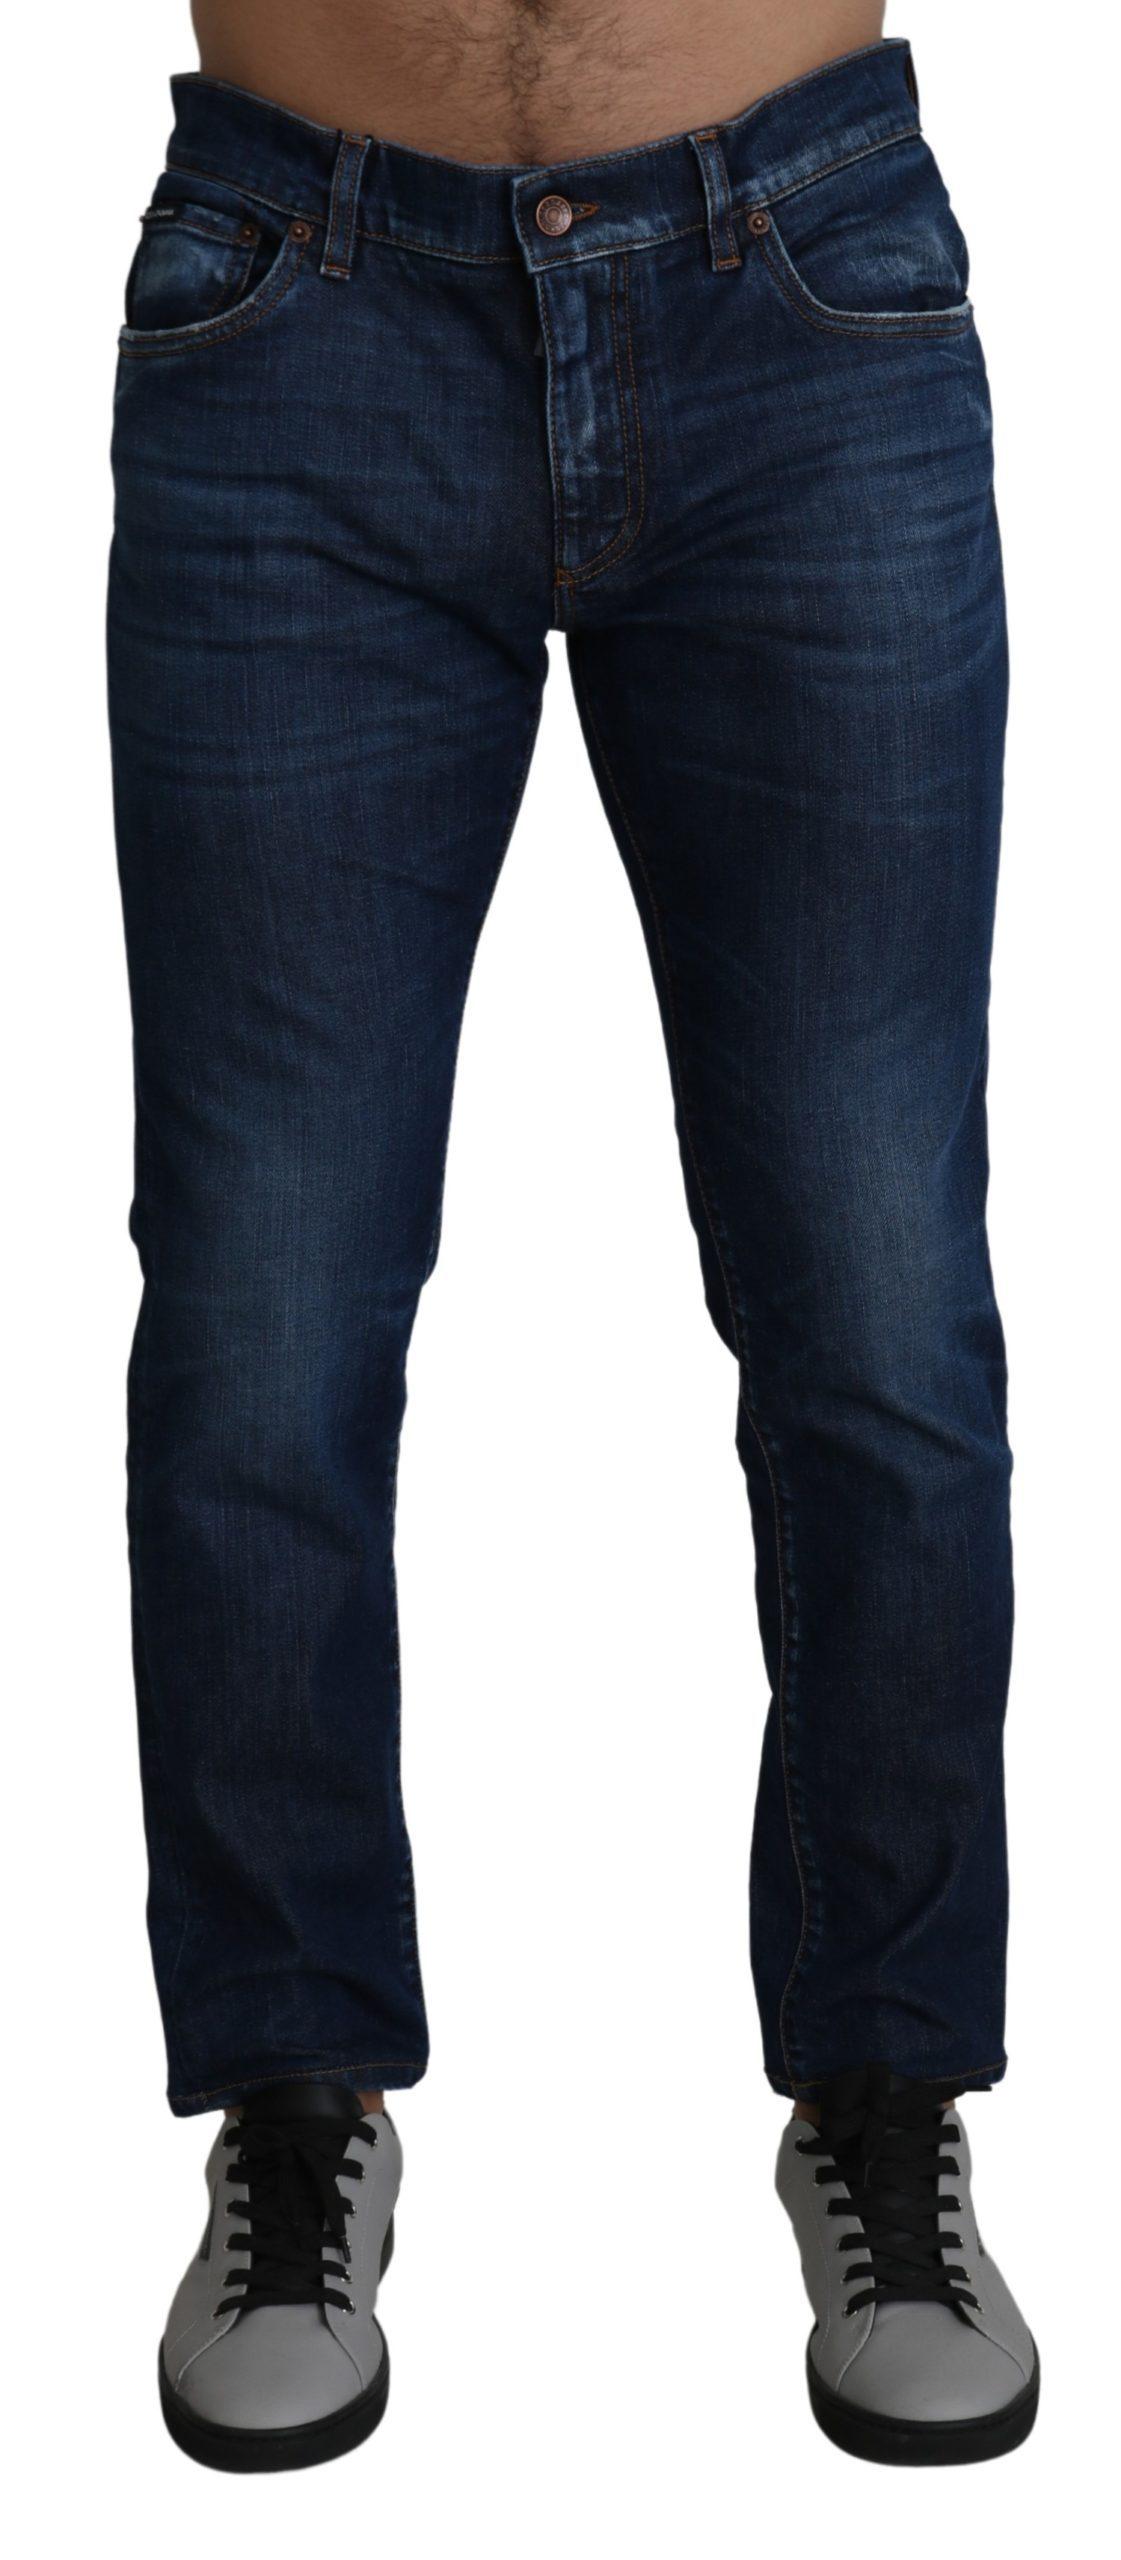 Dolce & Gabbana Men's Washed Skinny Denim Stretch Jeans Blue PAN71401 - IT52   XL